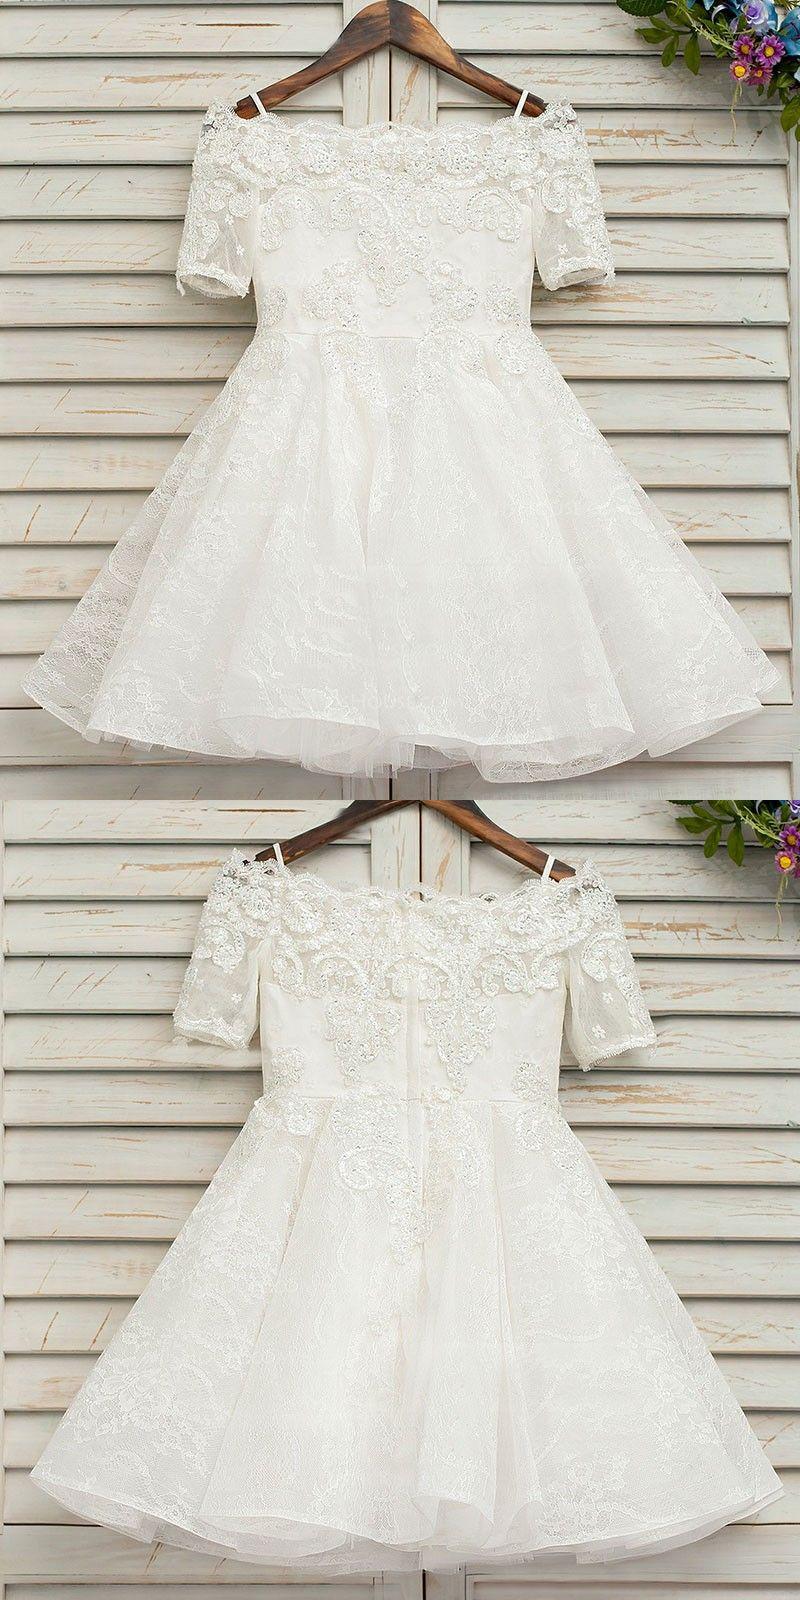 Aline offtheshoulder half sleeves lace flower girl dress with